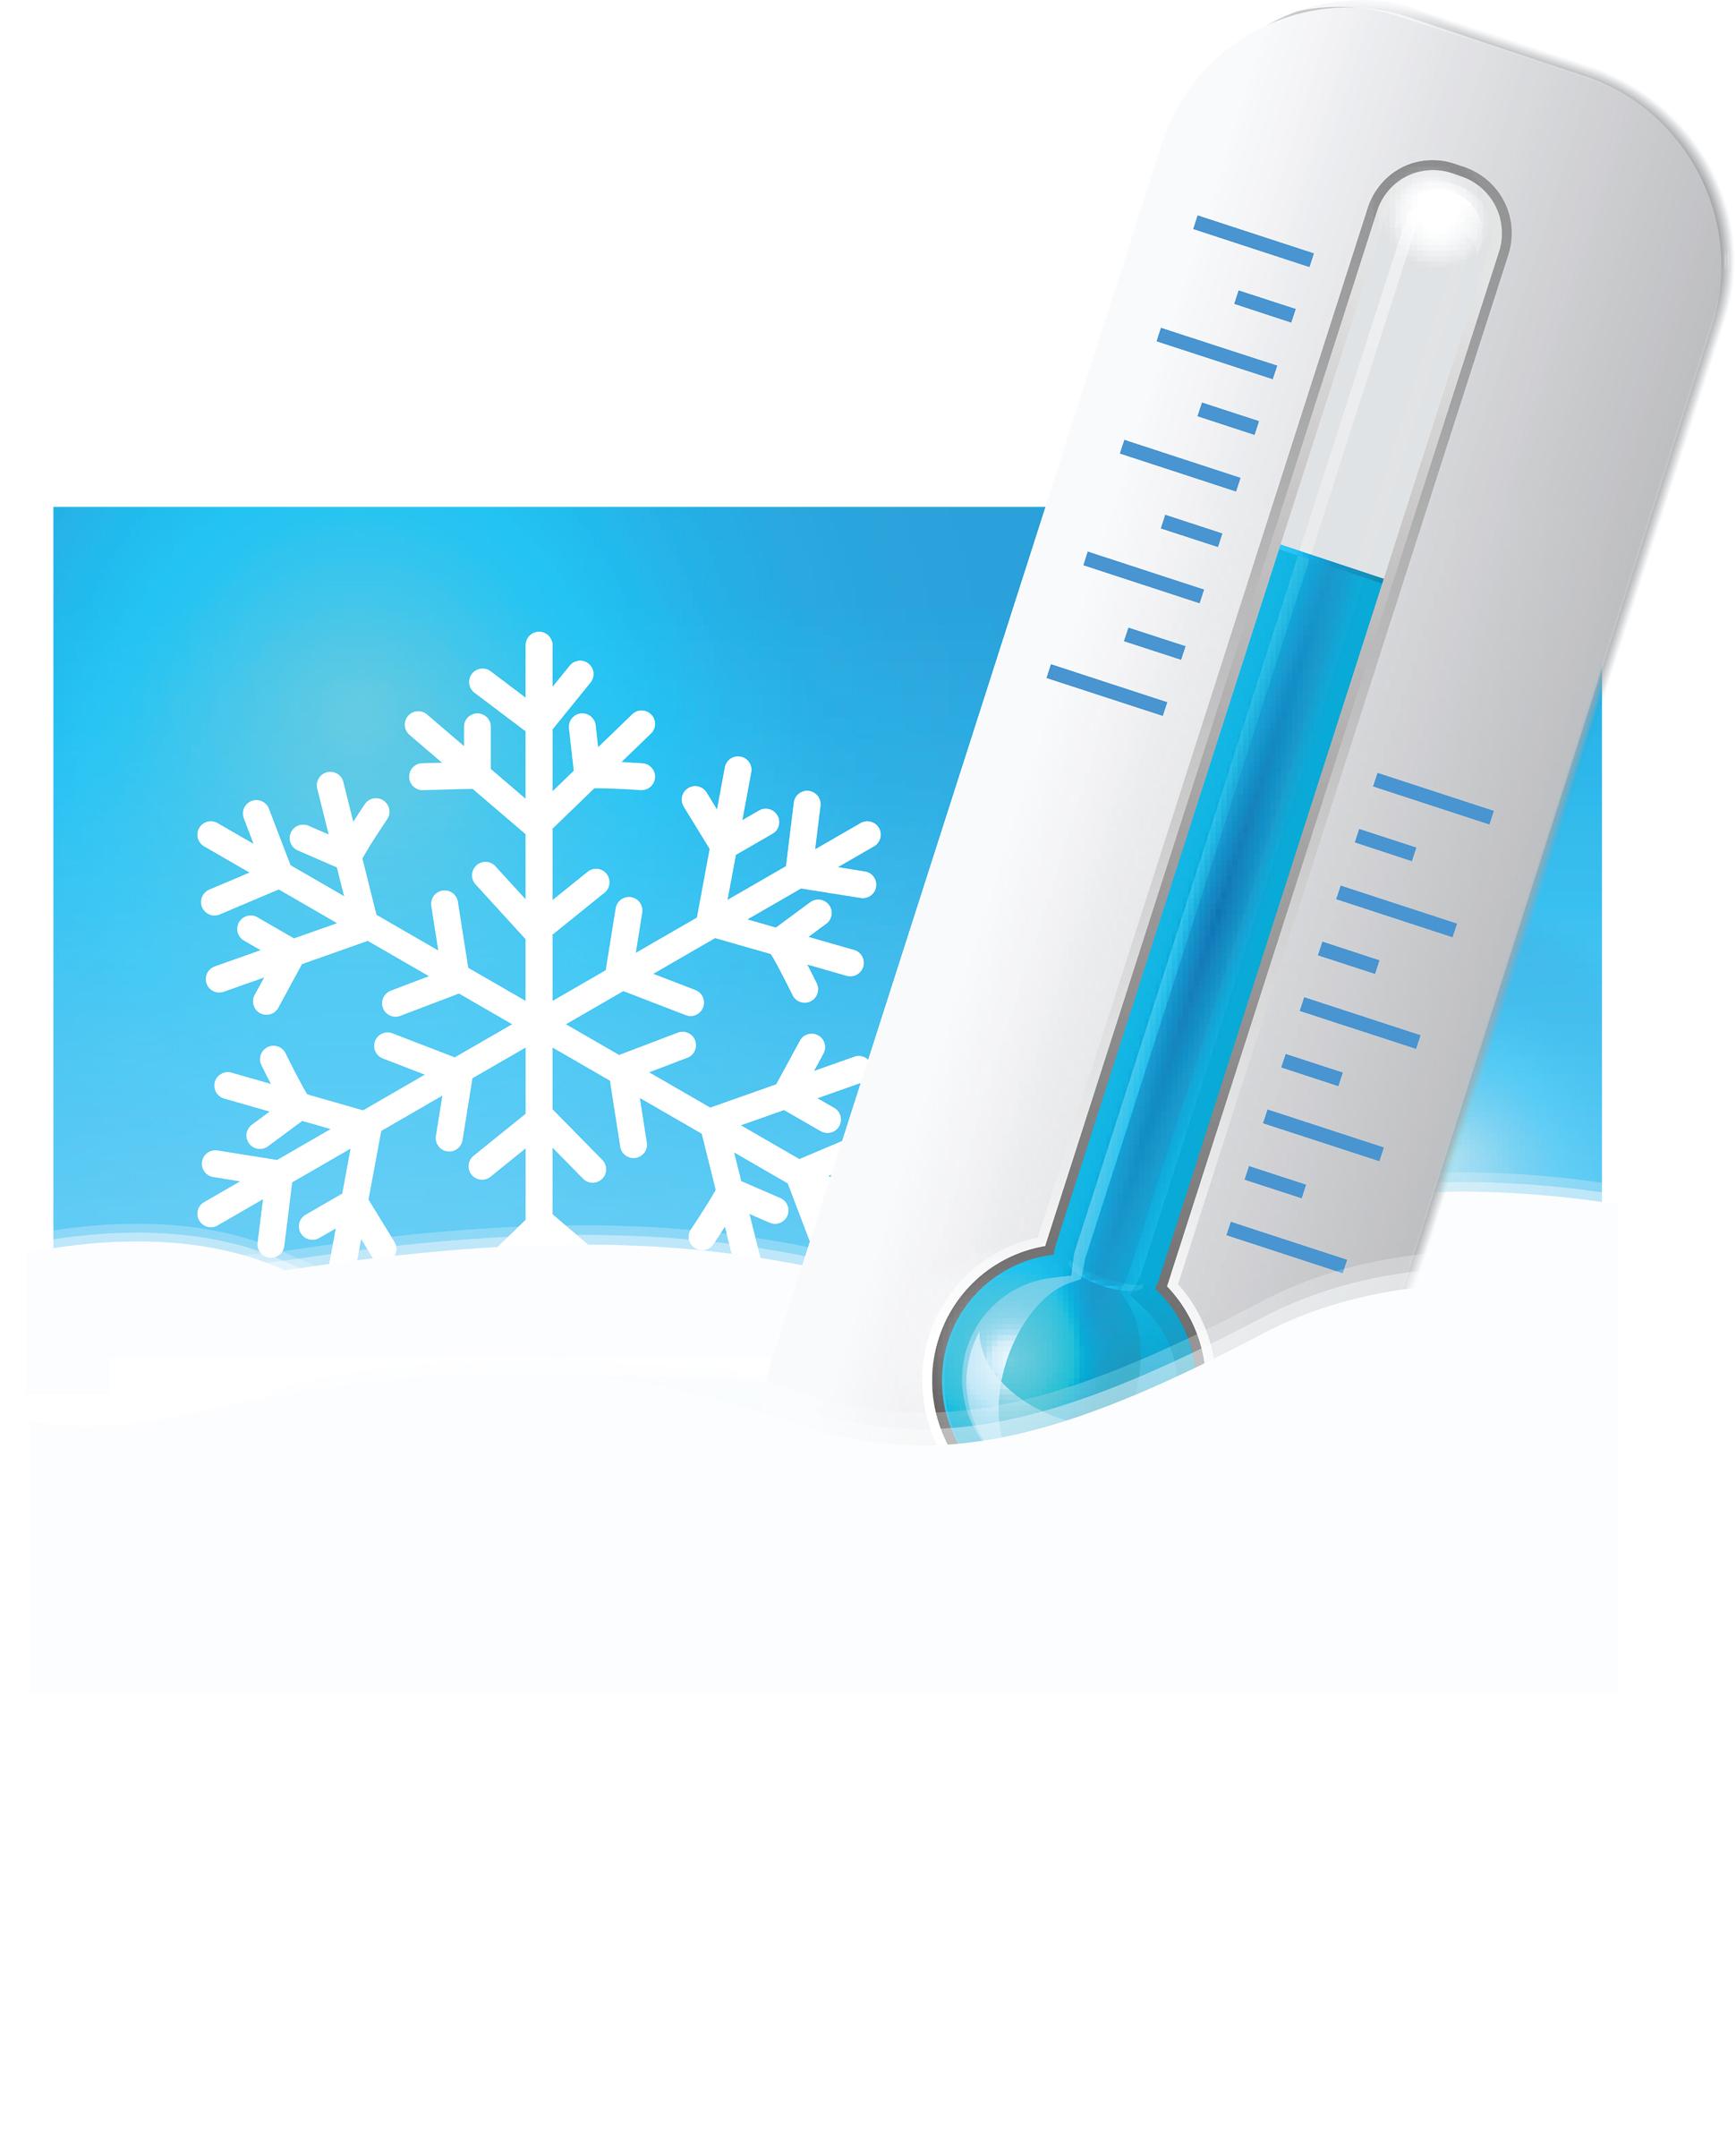 Clipart thermometer winter, Clipart thermometer winter.